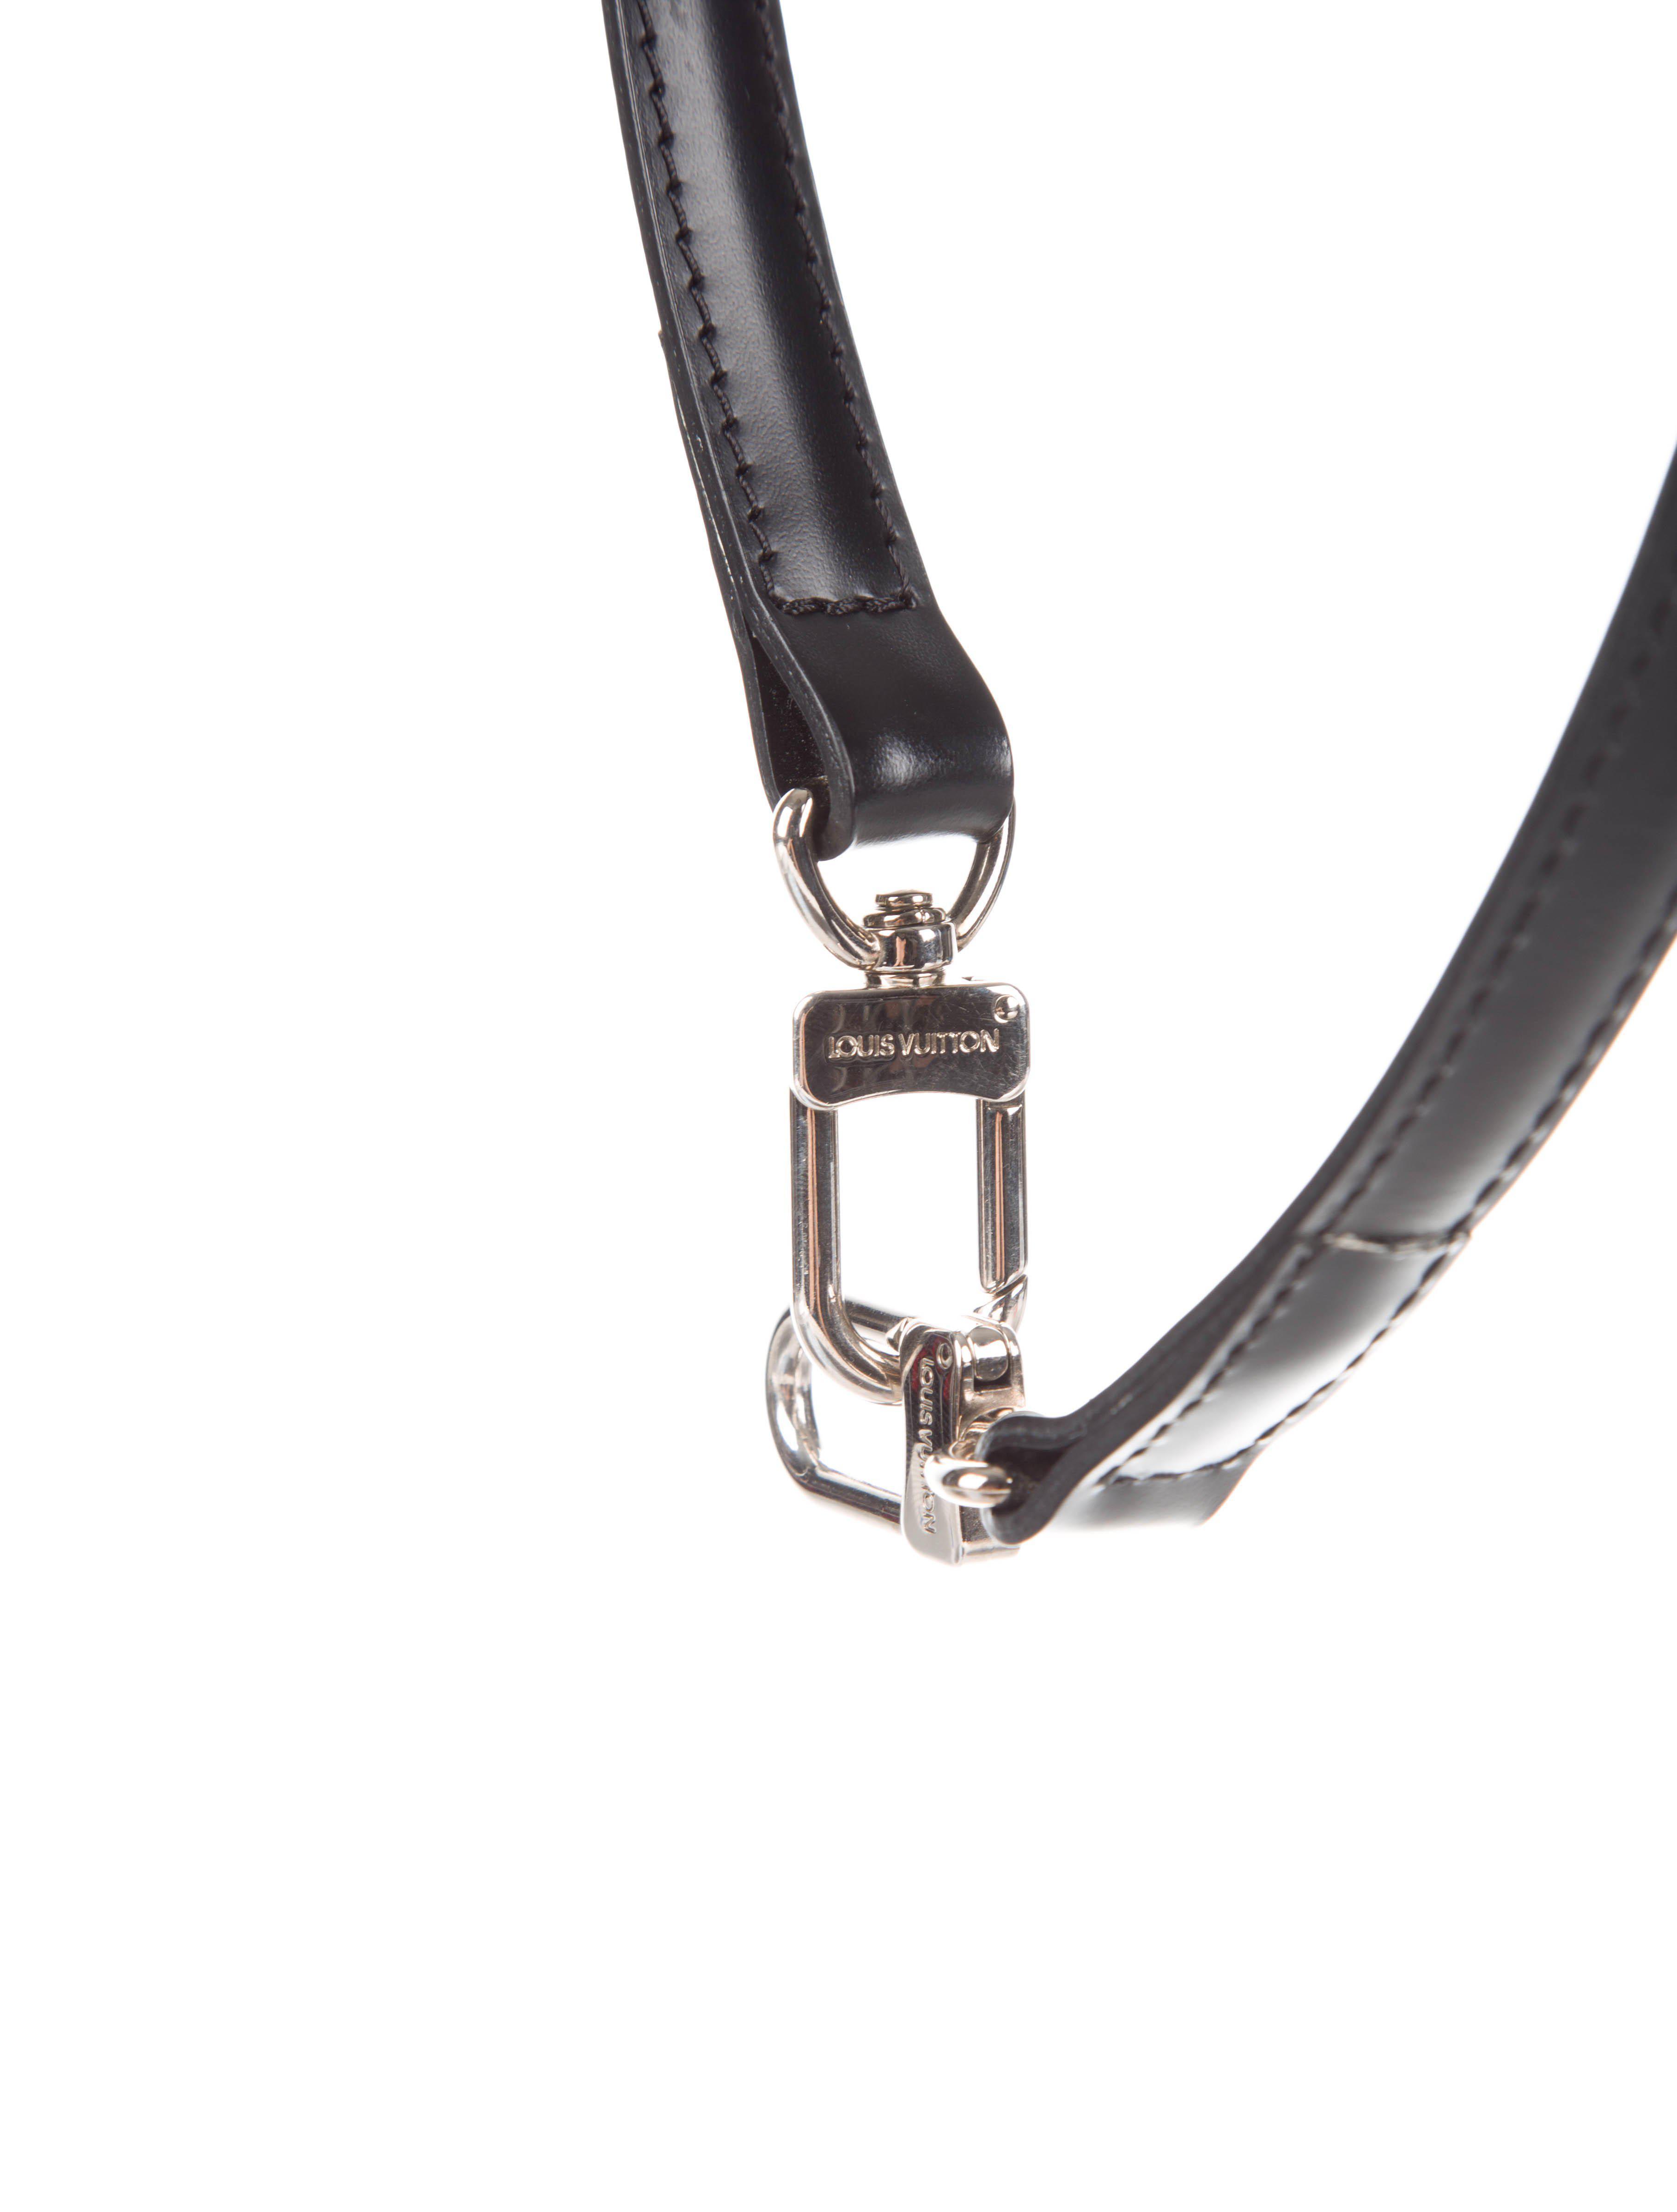 975b43c67a68 ... latest design dfd53 4bd16 Lyst - Louis Vuitton Adjustable Shoulder  Strap Black in Meta ...